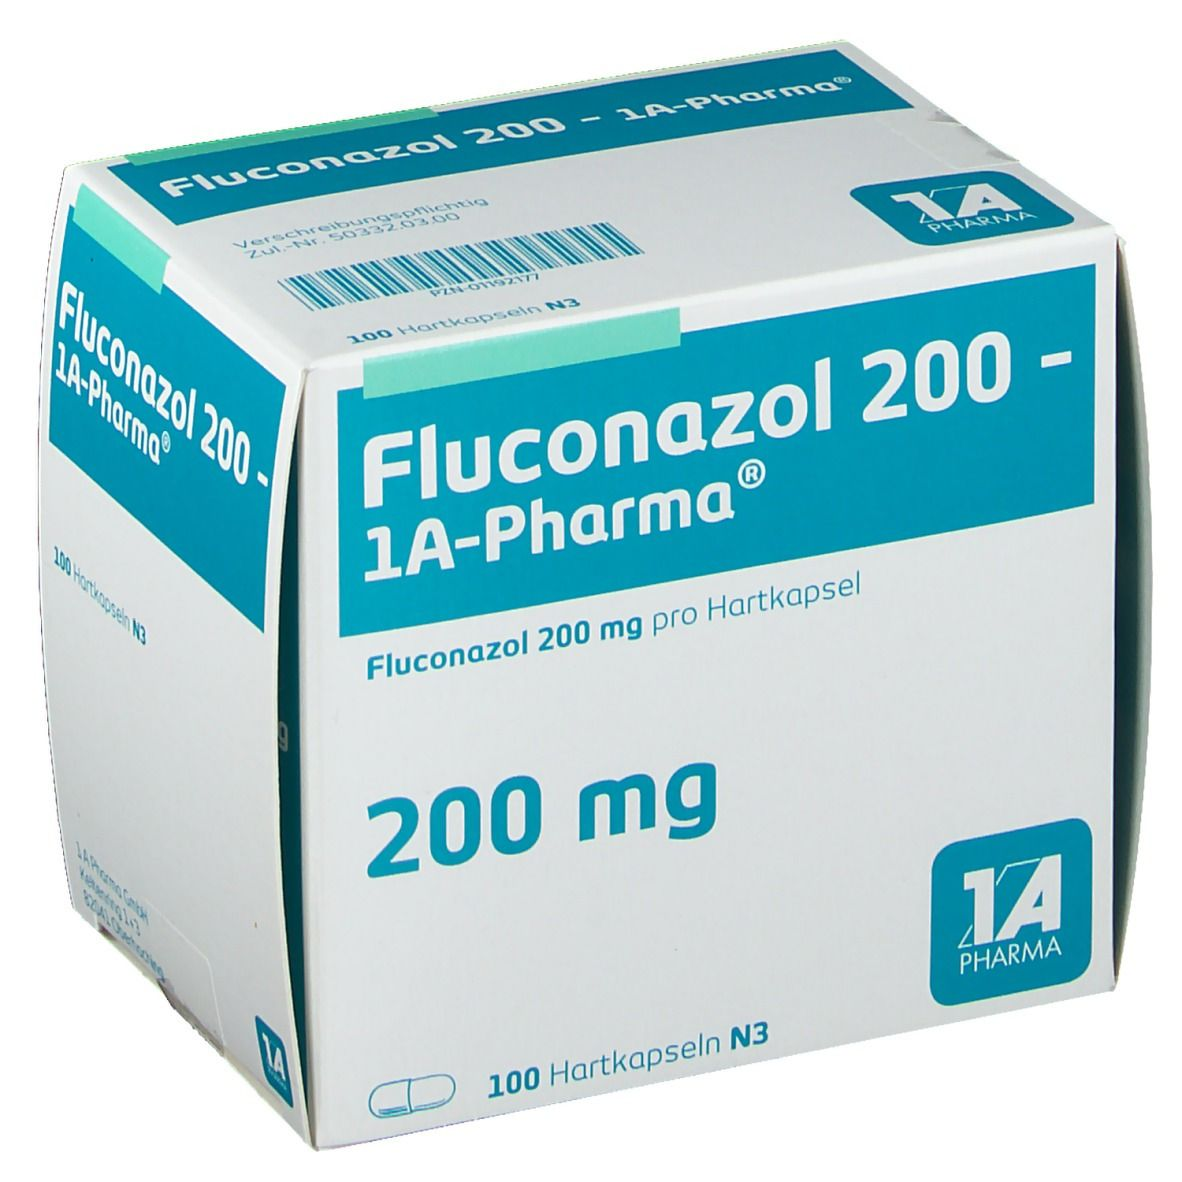 Fluconazol 200 1a Pharma Kapseln